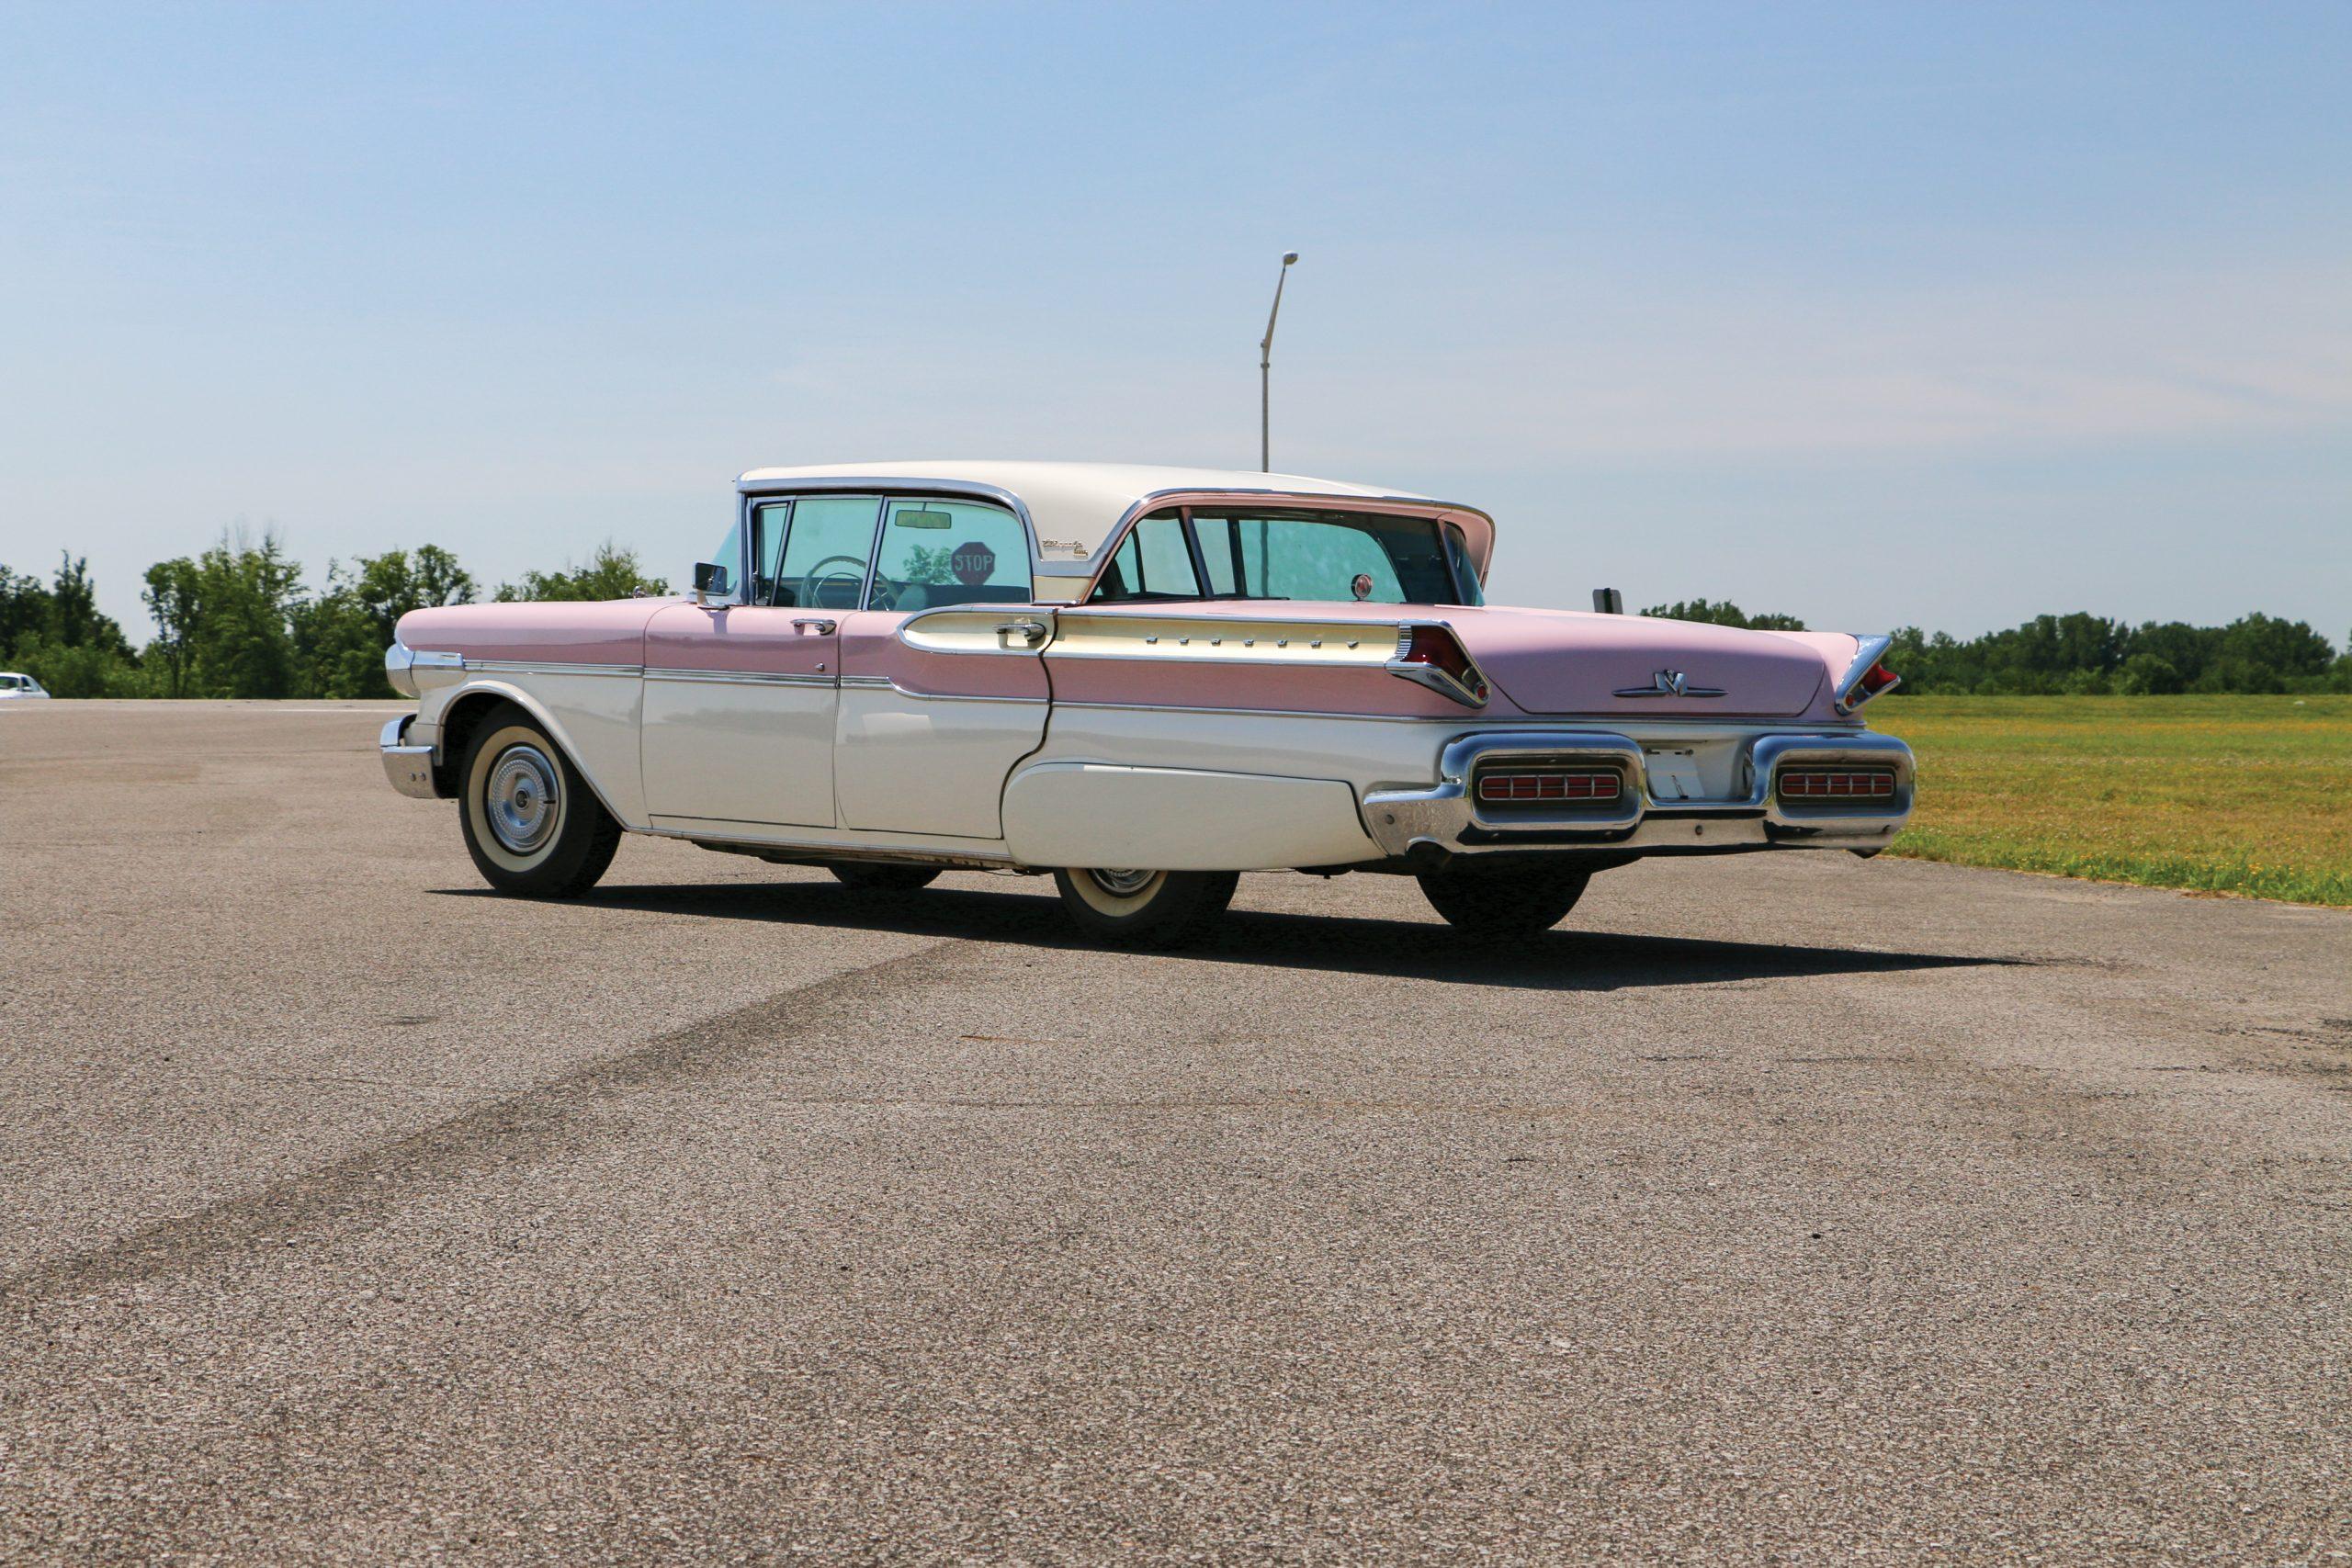 1957-Mercury-Turnpike-Cruiser-Four-Door-Sedan rear three quarter